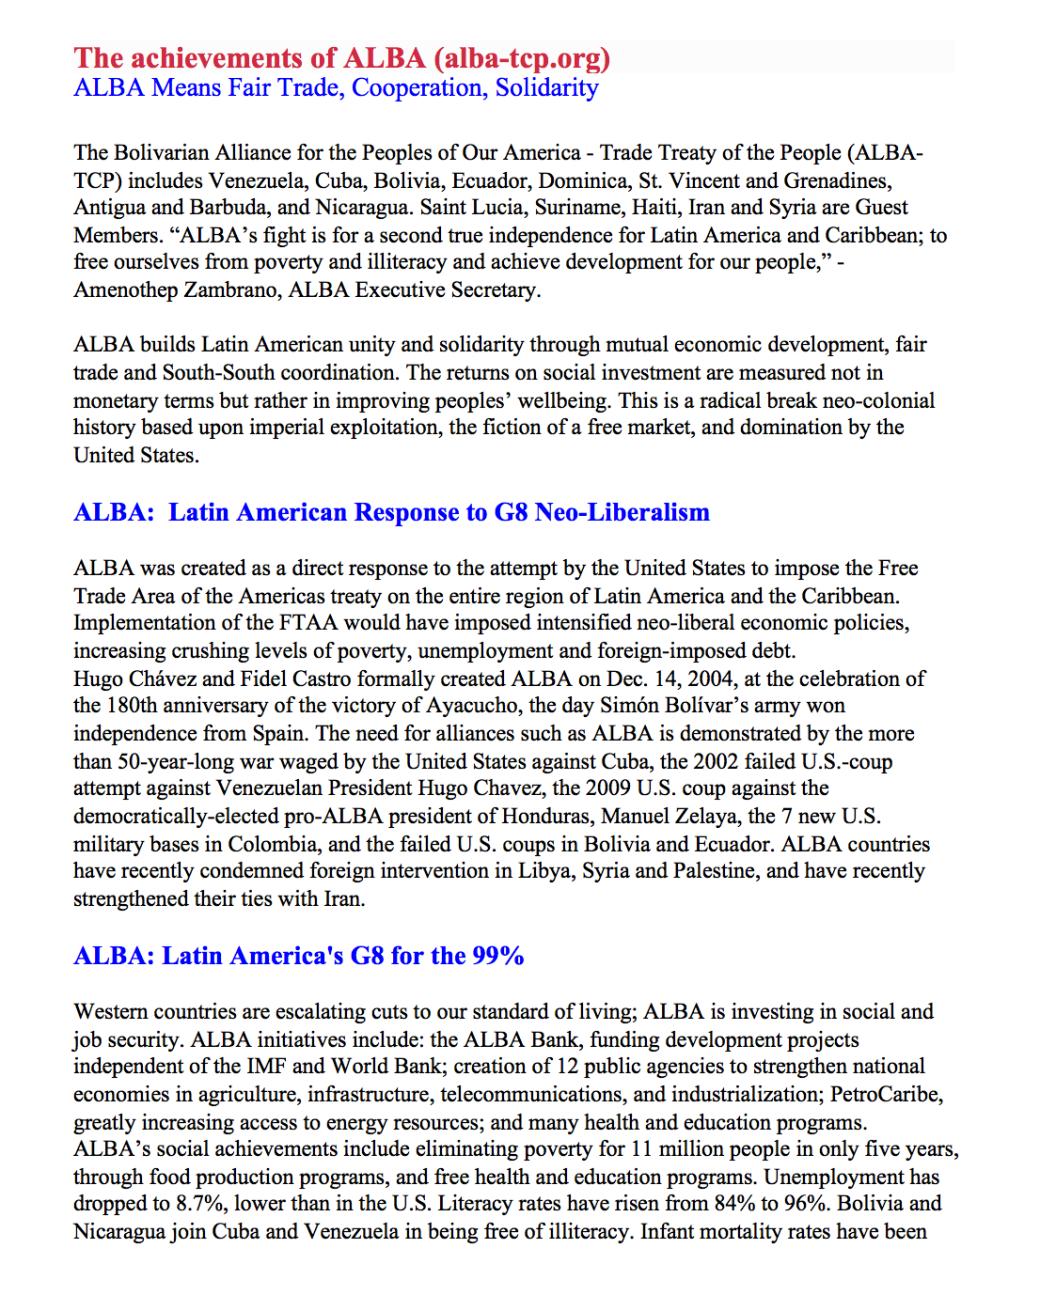 alba-march-22-23-2012-aiba-part-2